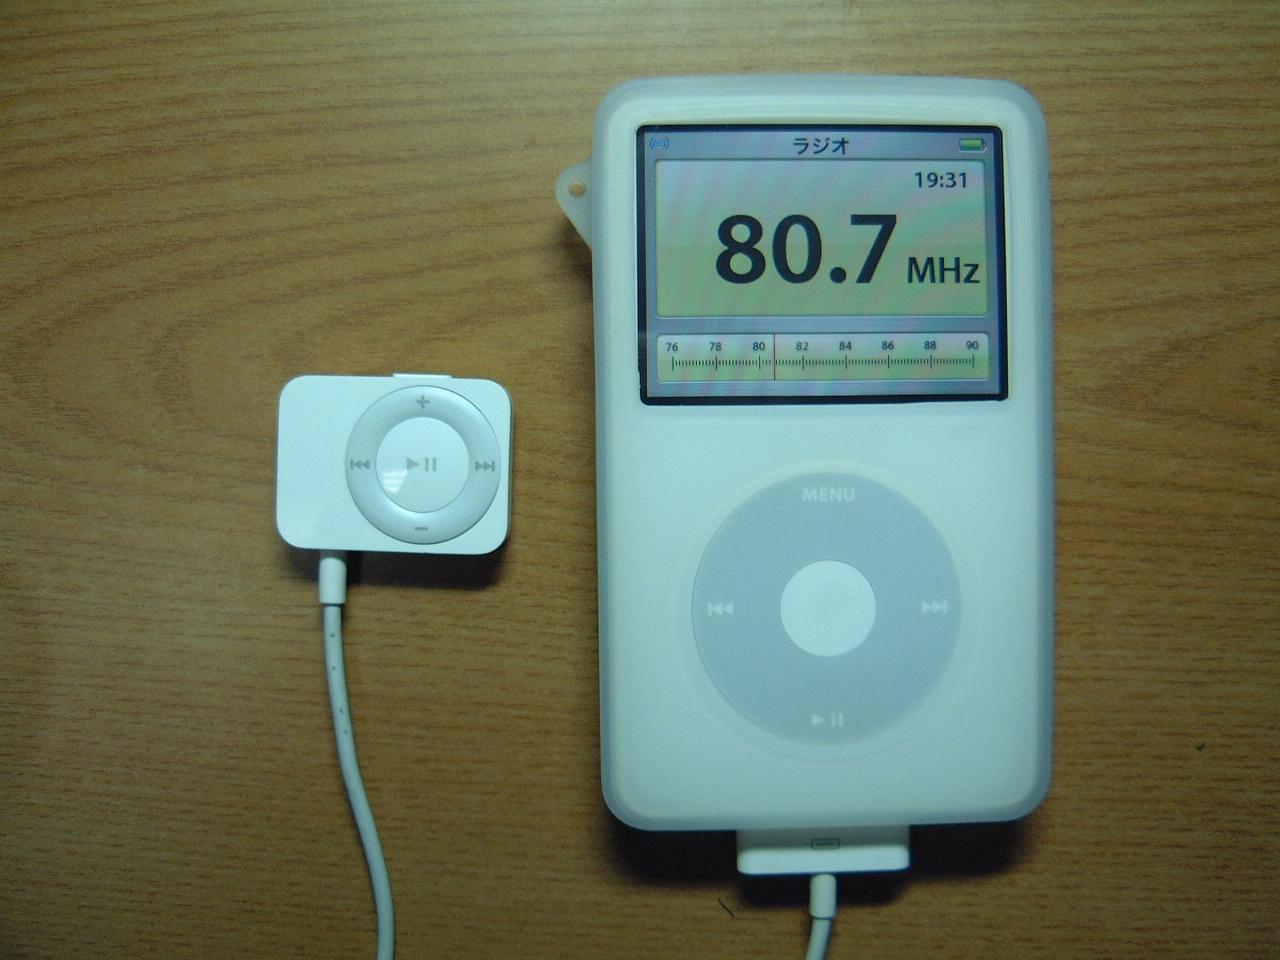 Fm Radio On Iphone  Without Internet